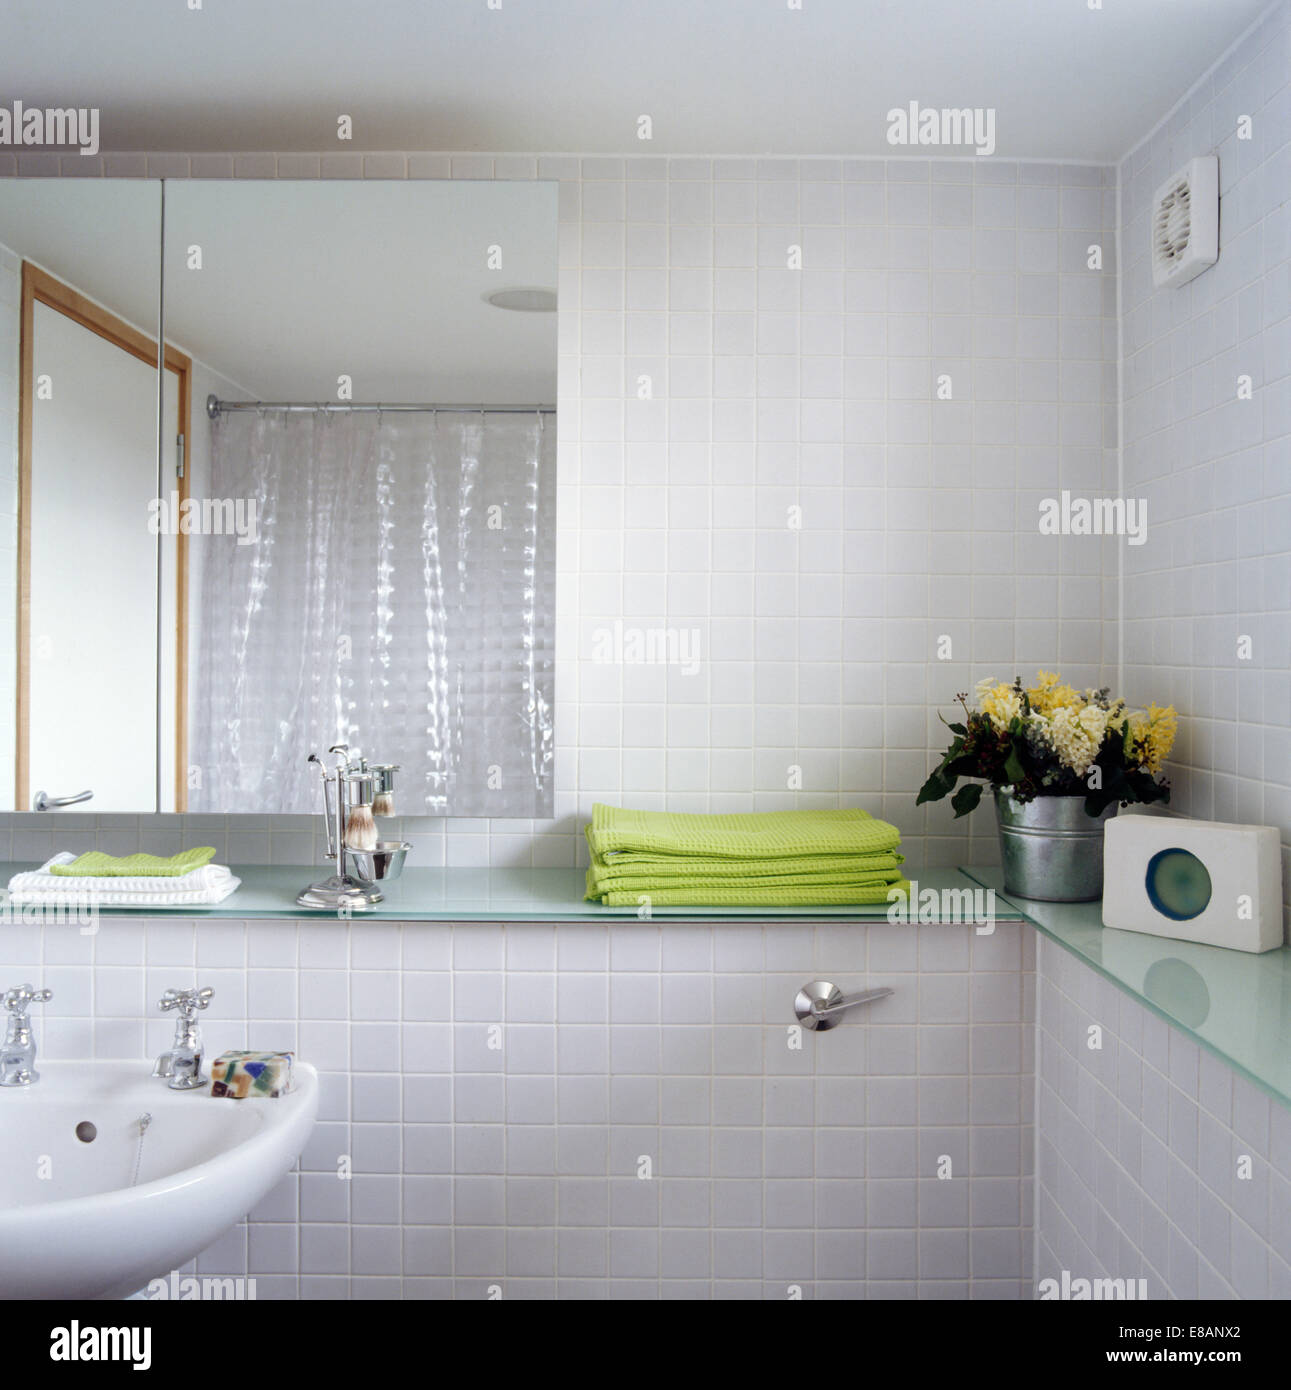 Green towels on vanity unit in modern white bathroom - Stock Image